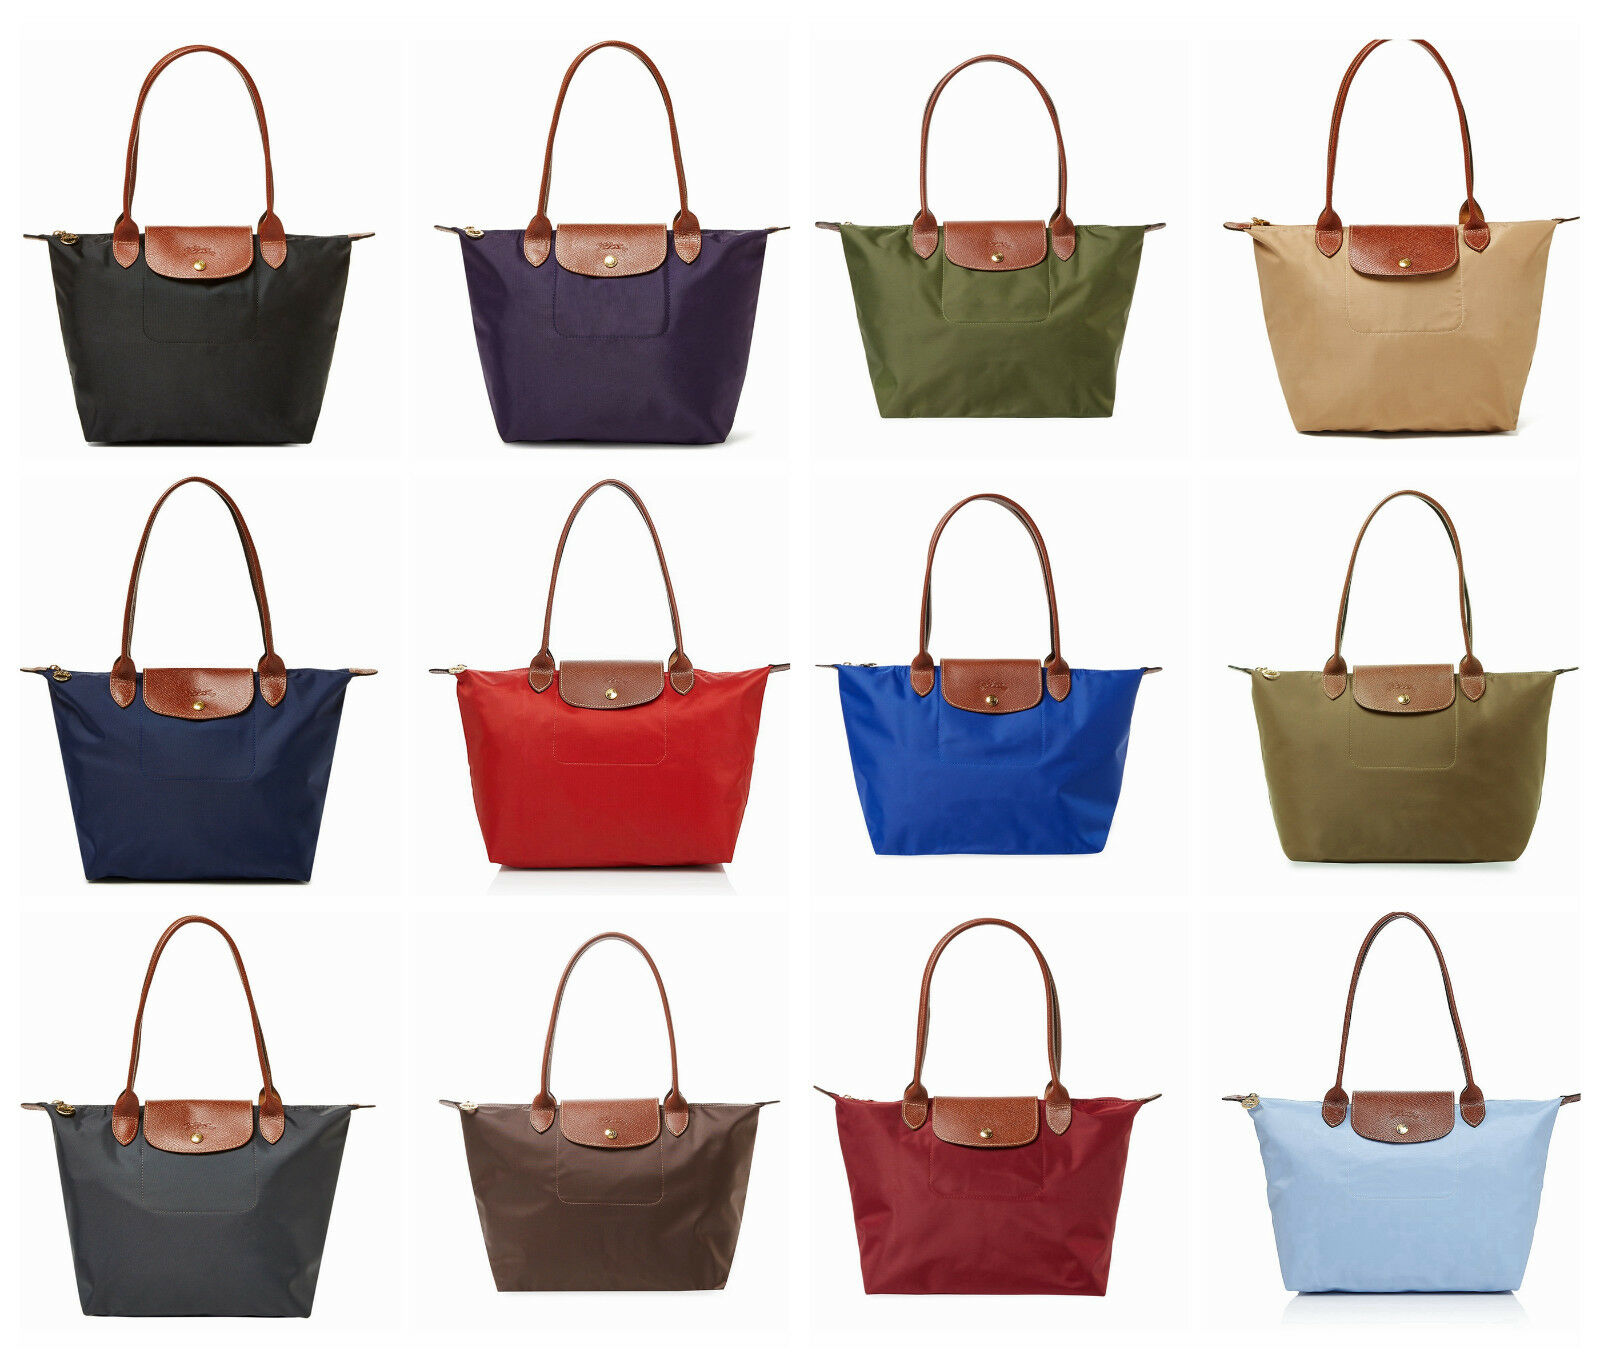 Longchamp Le Pliage Medium Nylon Tote Bag 2605089 Burnt Red Authentic Ebay